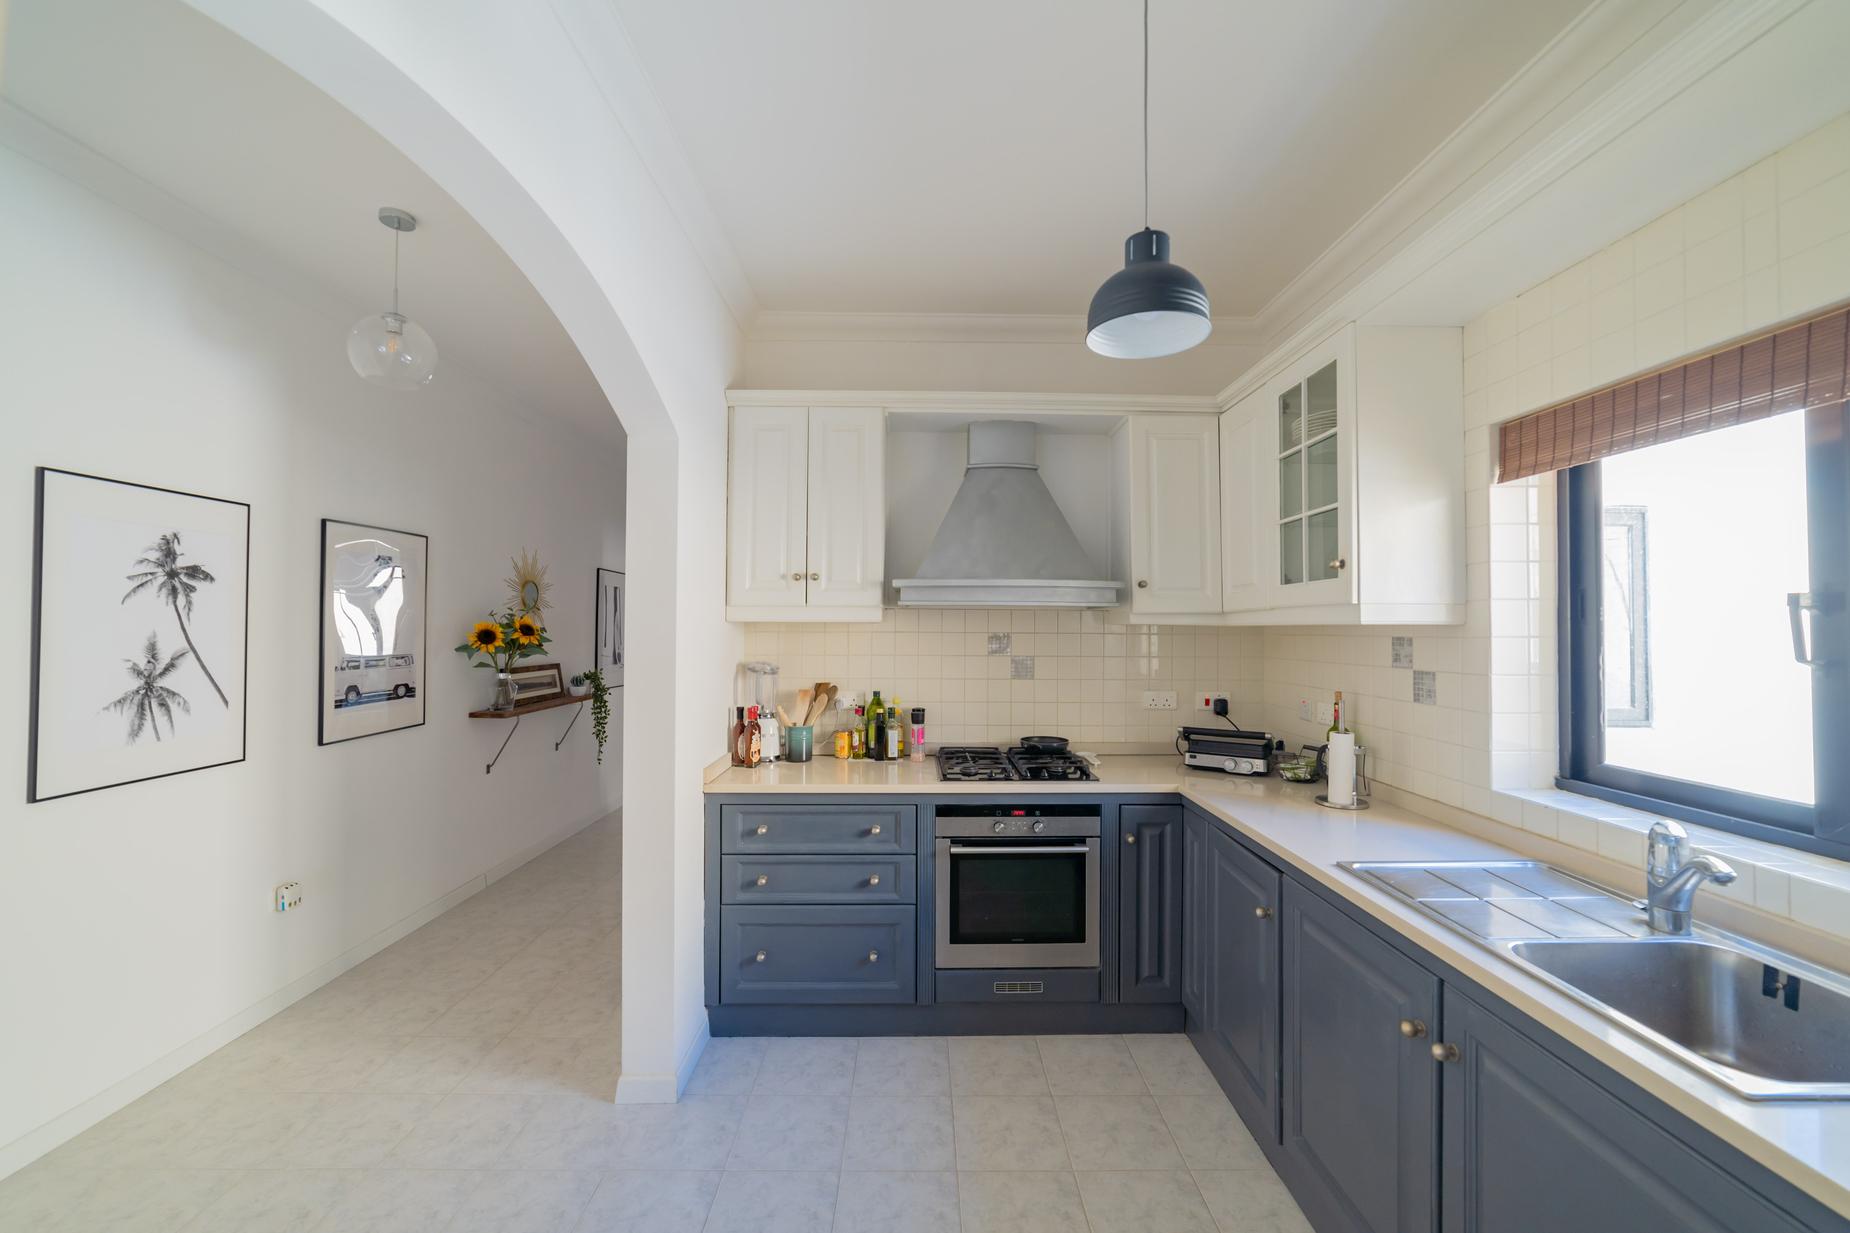 3 bed Apartment For Sale in Naxxar, Naxxar - thumb 5